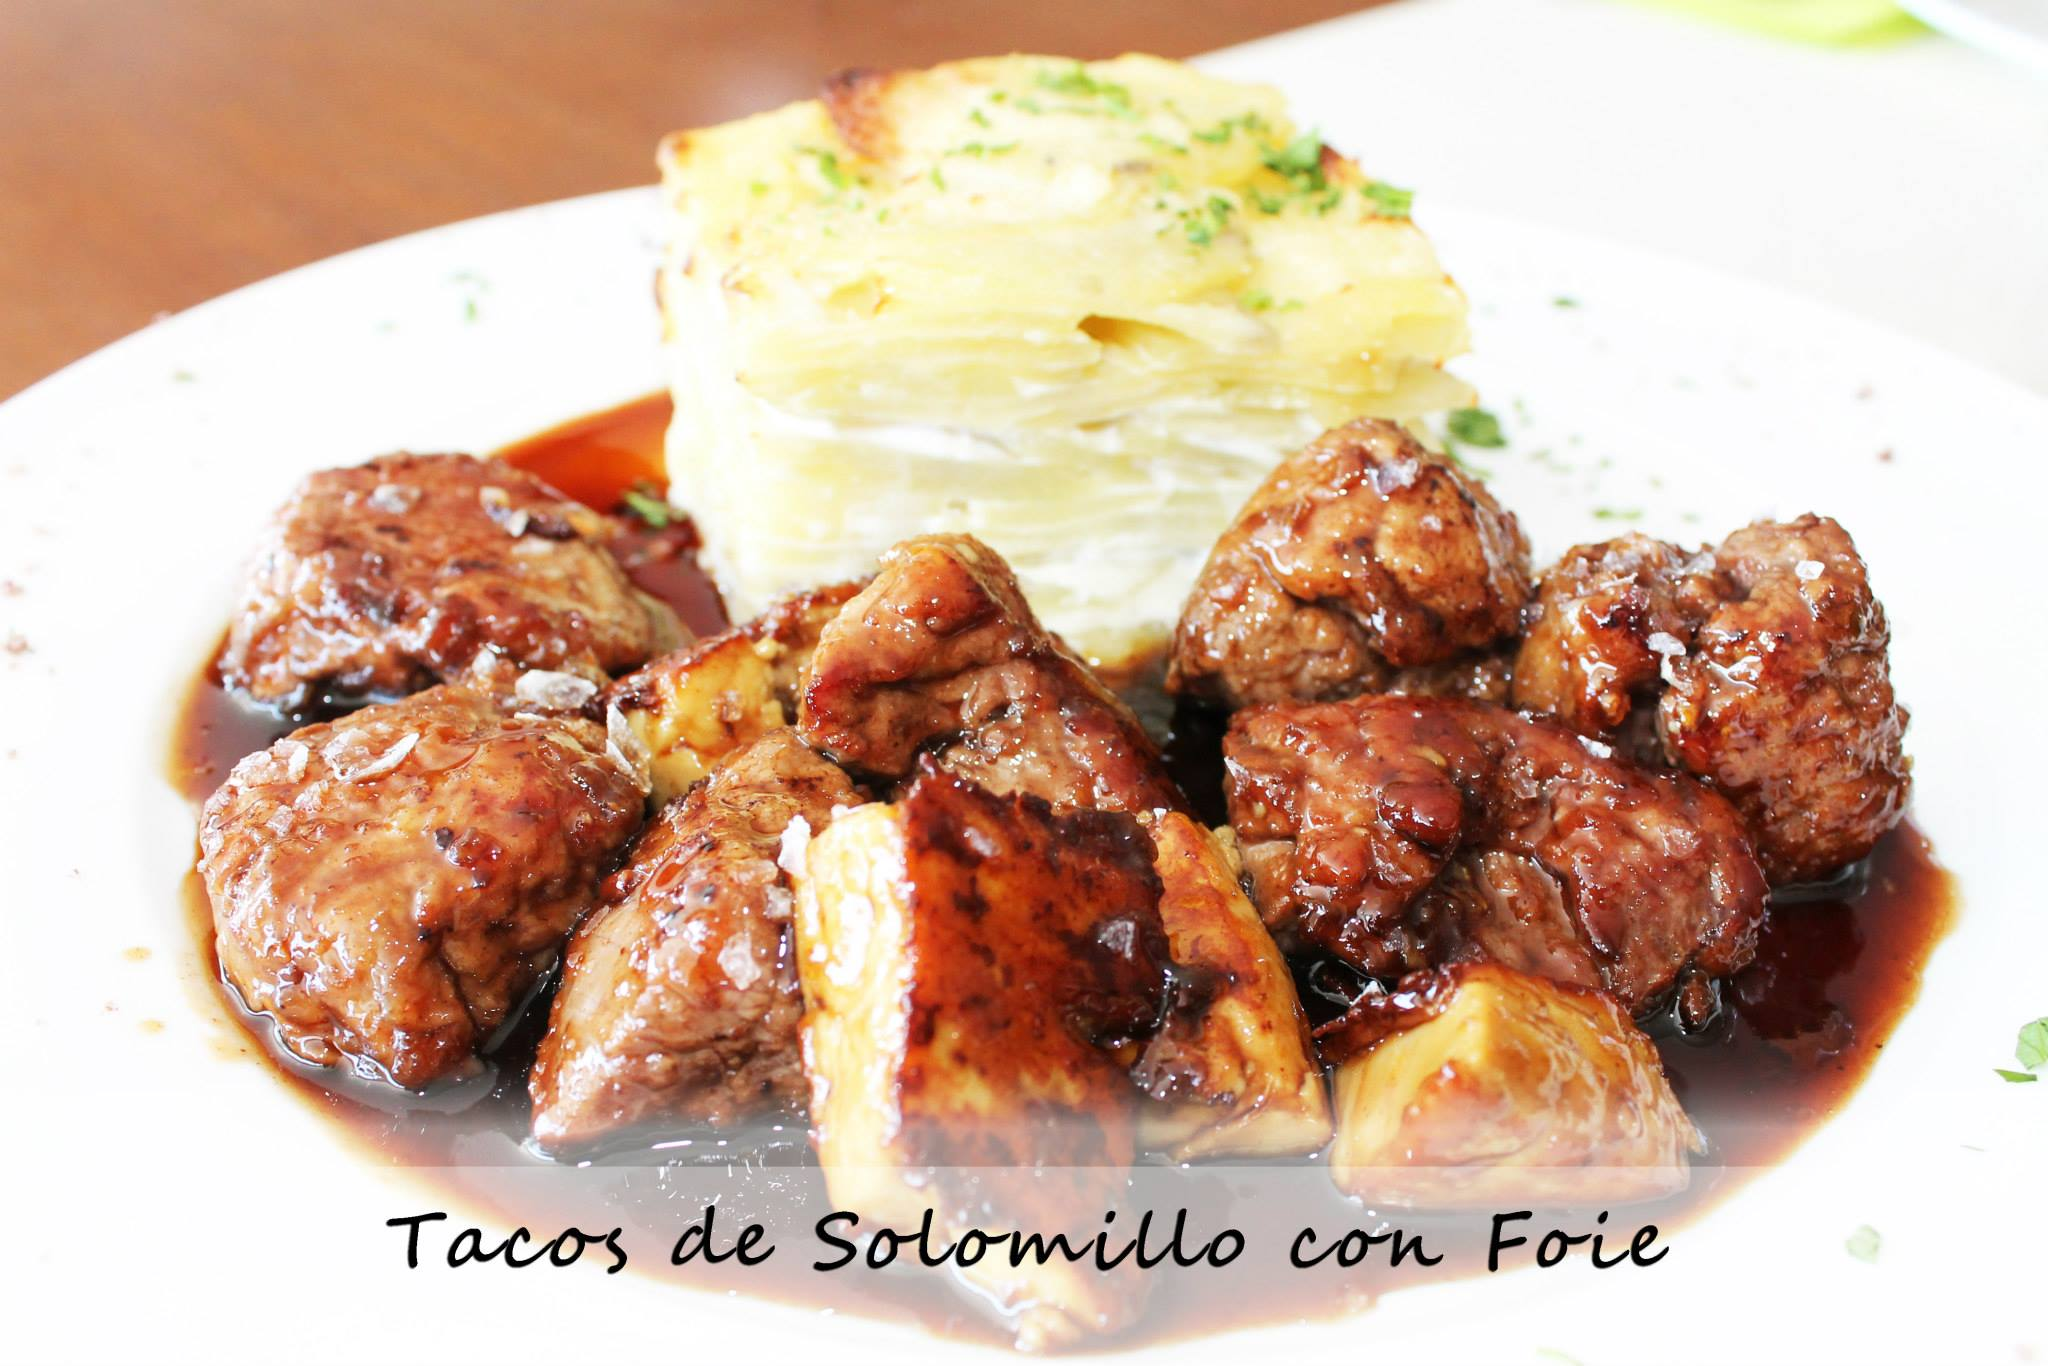 shamrock palma tacos solomillo con foie